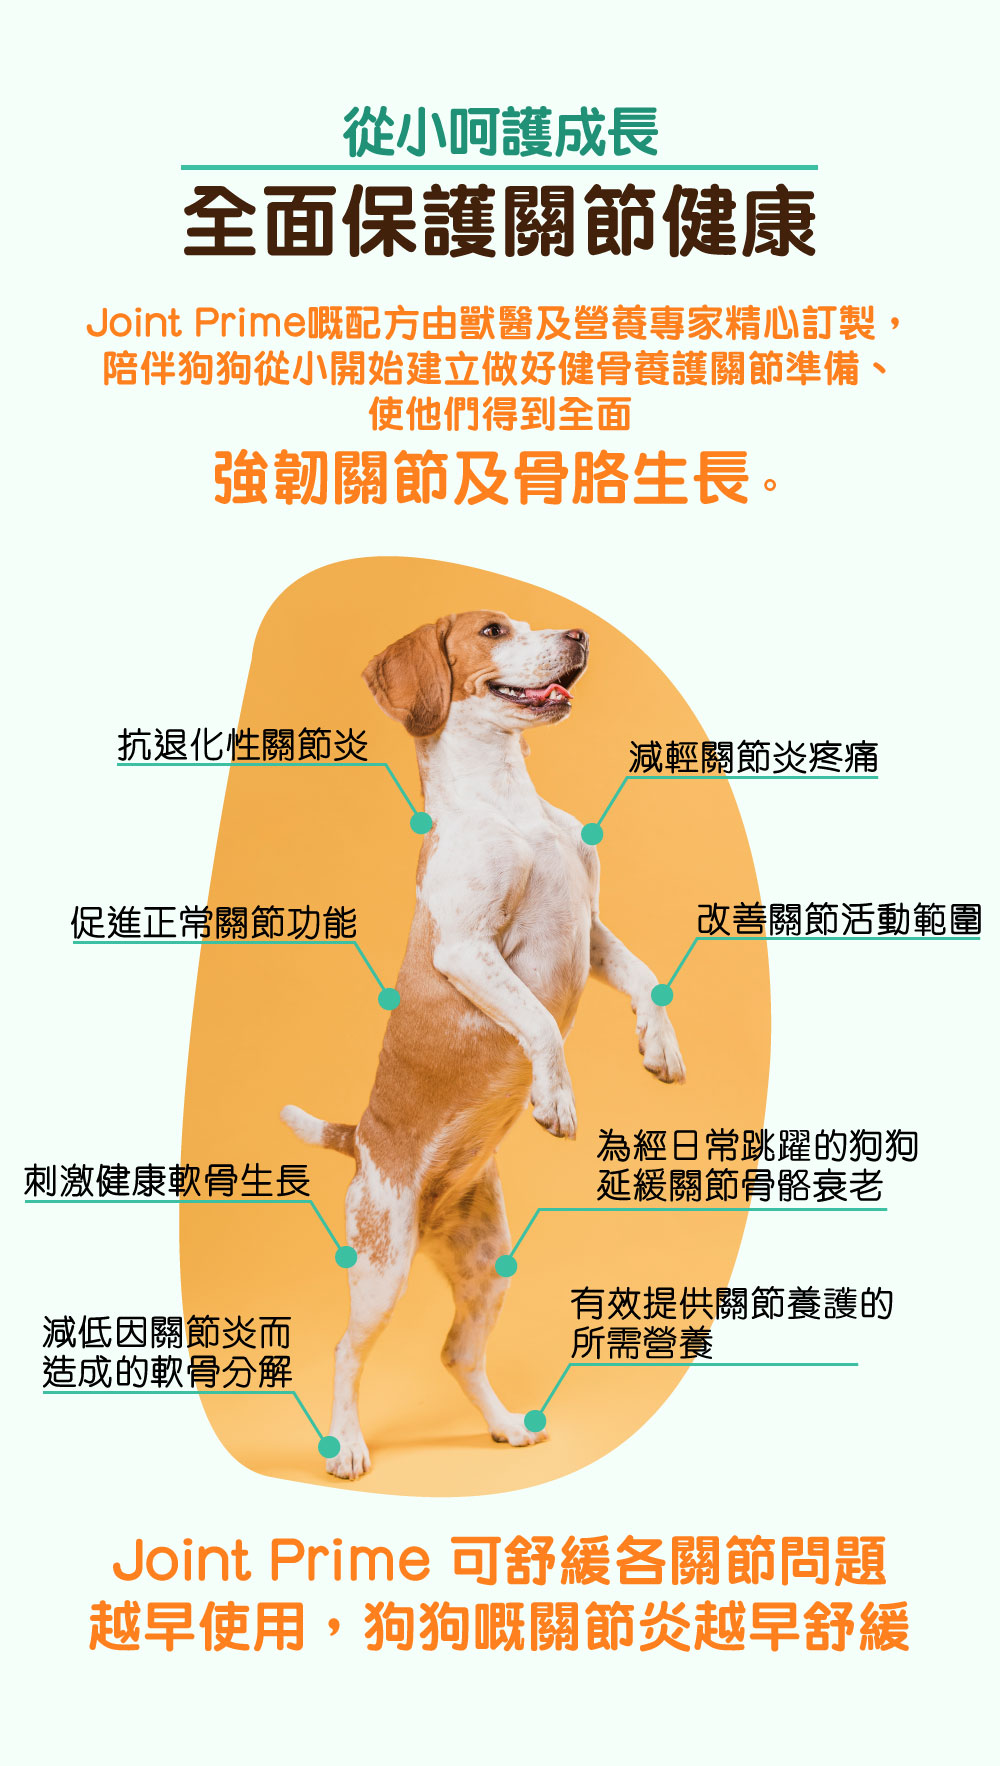 Pet Pet Premier, Joint Prime, Health Prime, 狗狗神仙粉, 关节神仙粉, 狗保健品 | 从小呵护成长 全面保护关节健康 陪伴狗狗从小开始建立做好健骨养护关节准备、使他们得到强韧关节及骨胳发育。 抗退化性关节炎 减轻关节炎疼痛 促进正常关节功能 改善关节活动范围 刺激健康软骨生长 为经常跳跃的狗狗推迟骨骼衰老 减低因关节炎而造成的软骨分解 有效提供关节养护的所需营养 越早使用,狗狗嘅关节炎越早舒缓